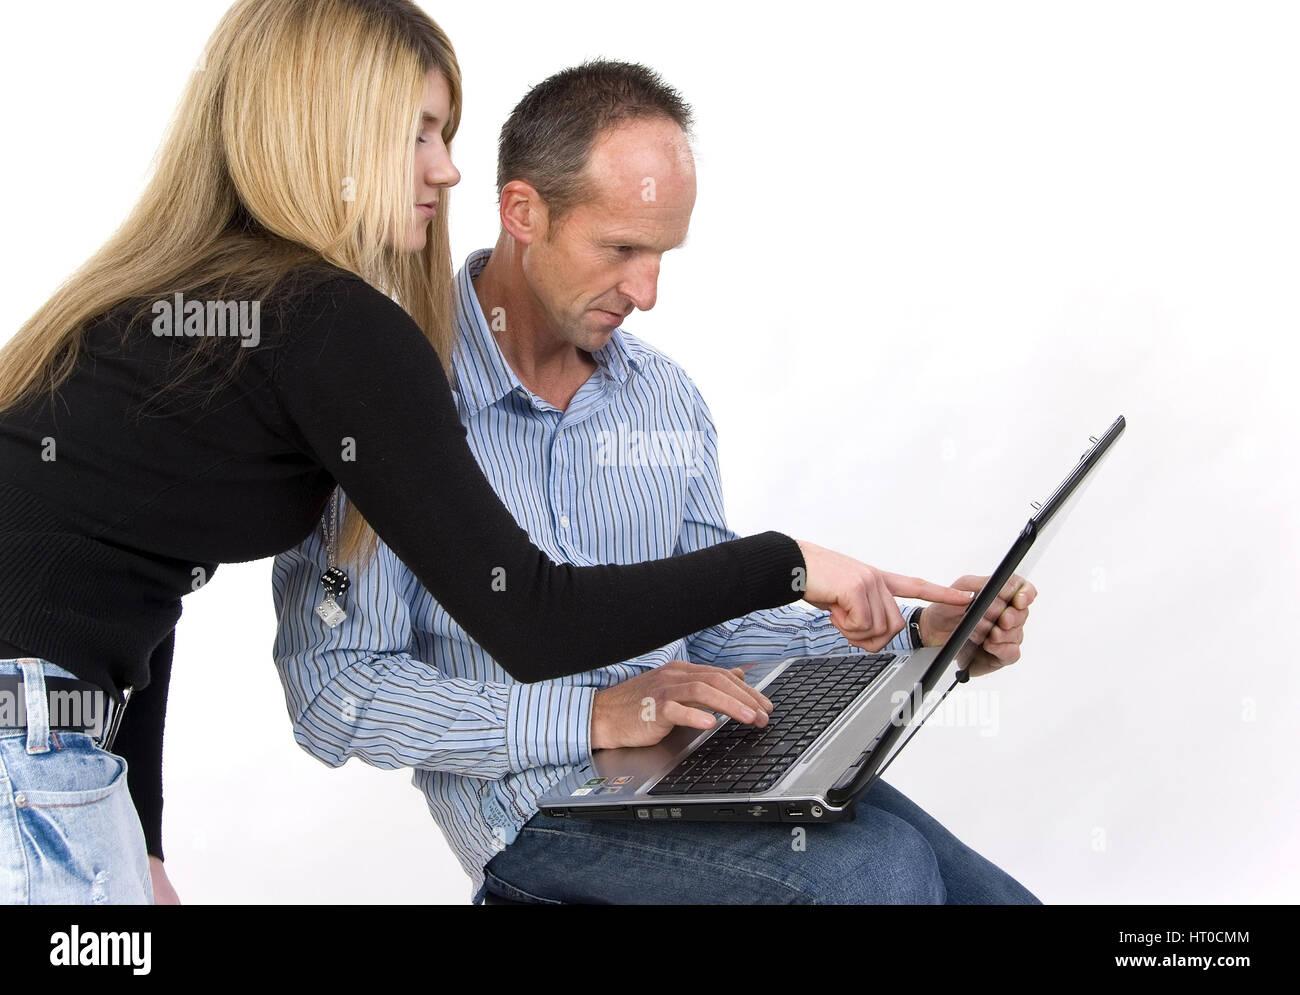 Mann und Frau bei der Arbeit am Laptop - man and woman using laptop - Stock Image